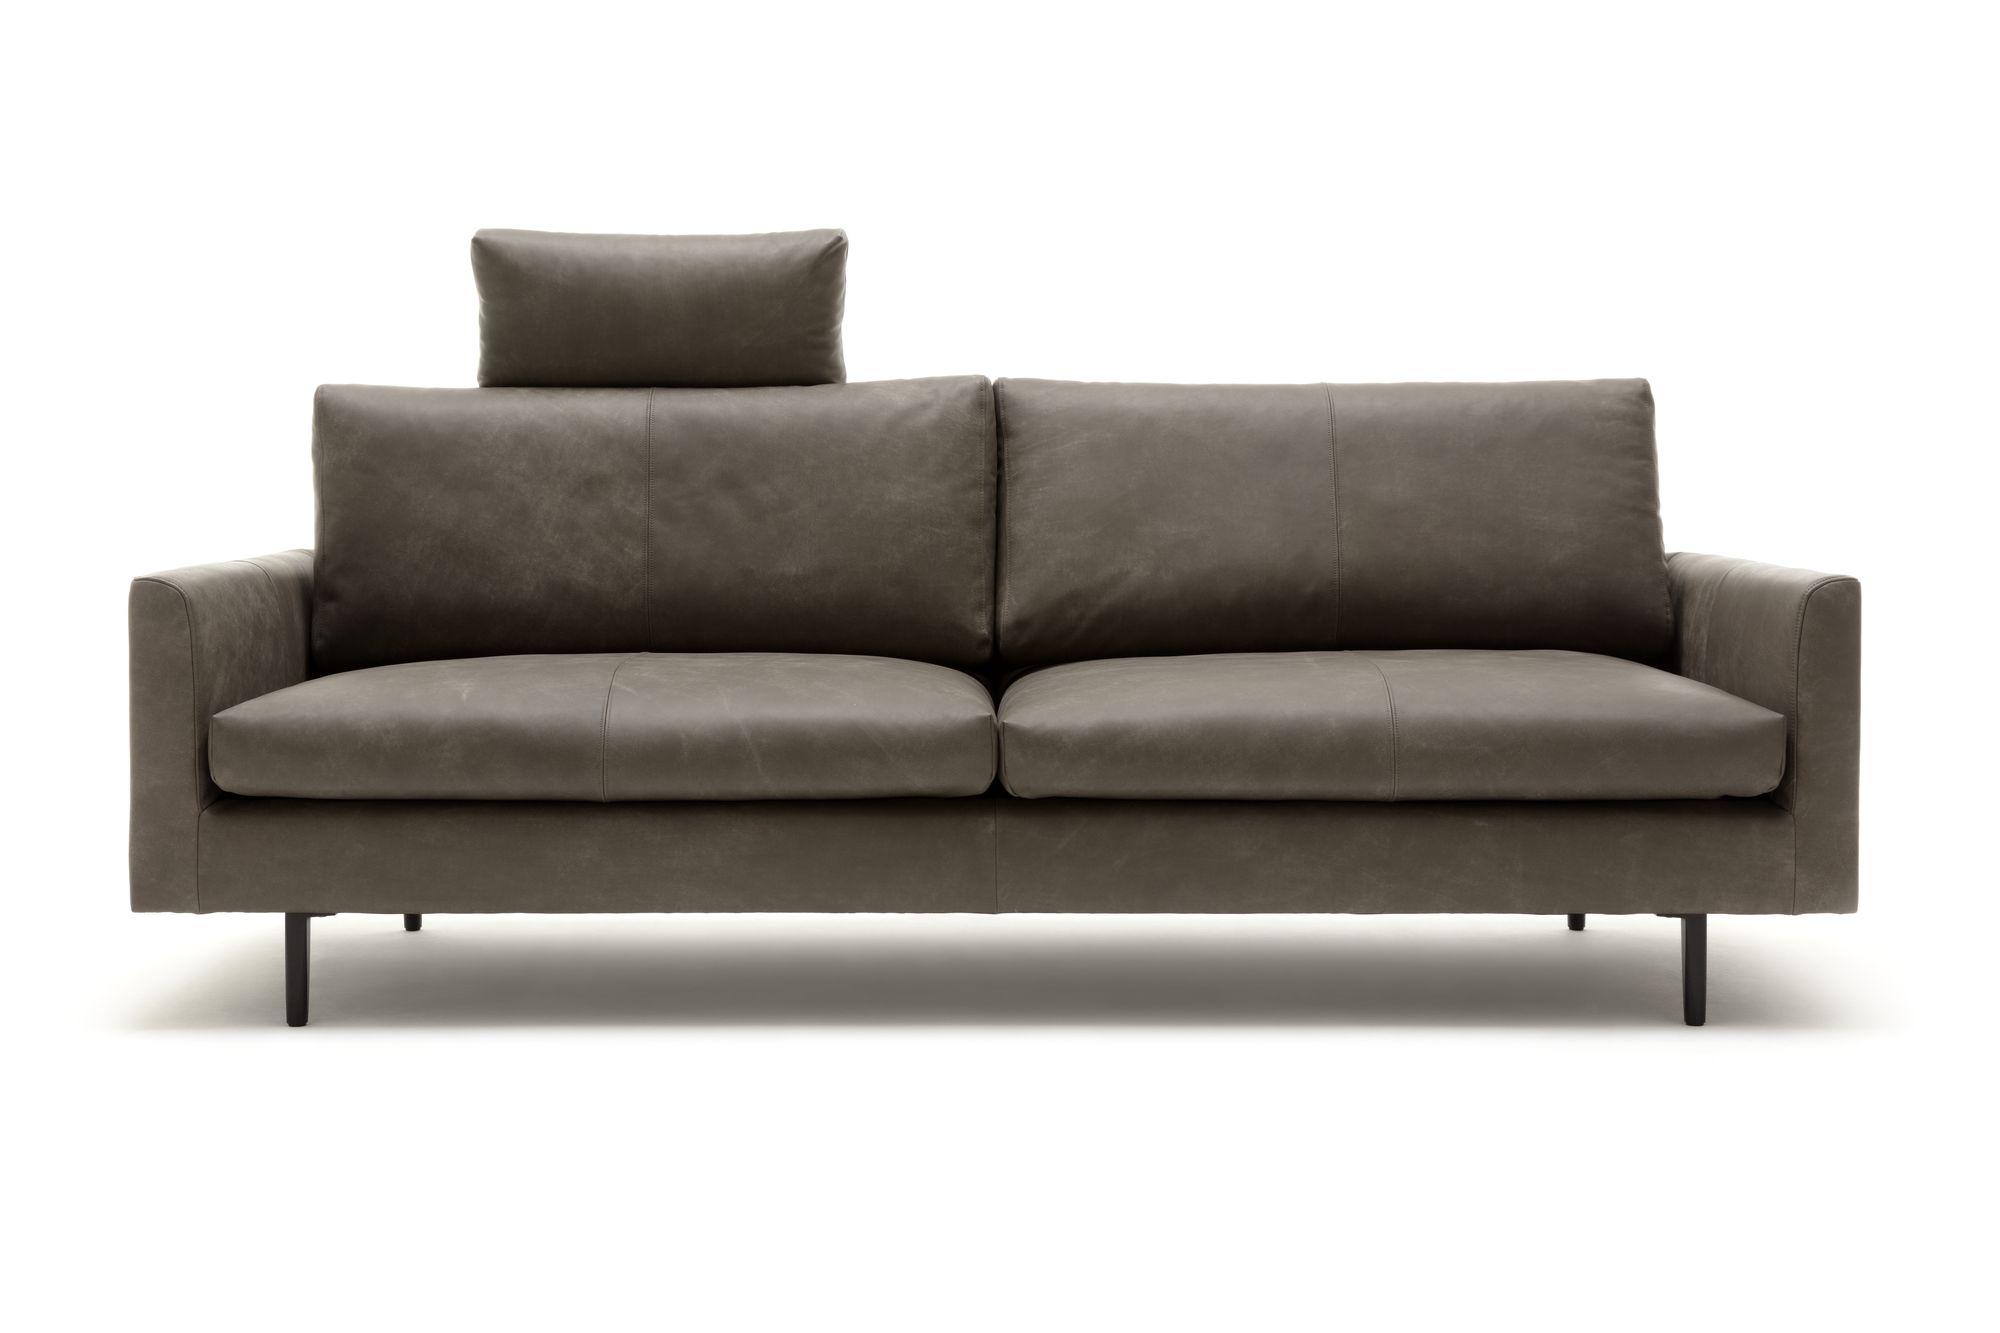 Full Size of Sofa Leder Braun Otto Rustikal Couch Vintage Gebraucht Chesterfield Kaufen 2 Sitzer   3 2 1 Ledersofa Design 3 Sitzer Ikea Set Freistil 134 In Braungrau Mit Sofa Sofa Leder Braun